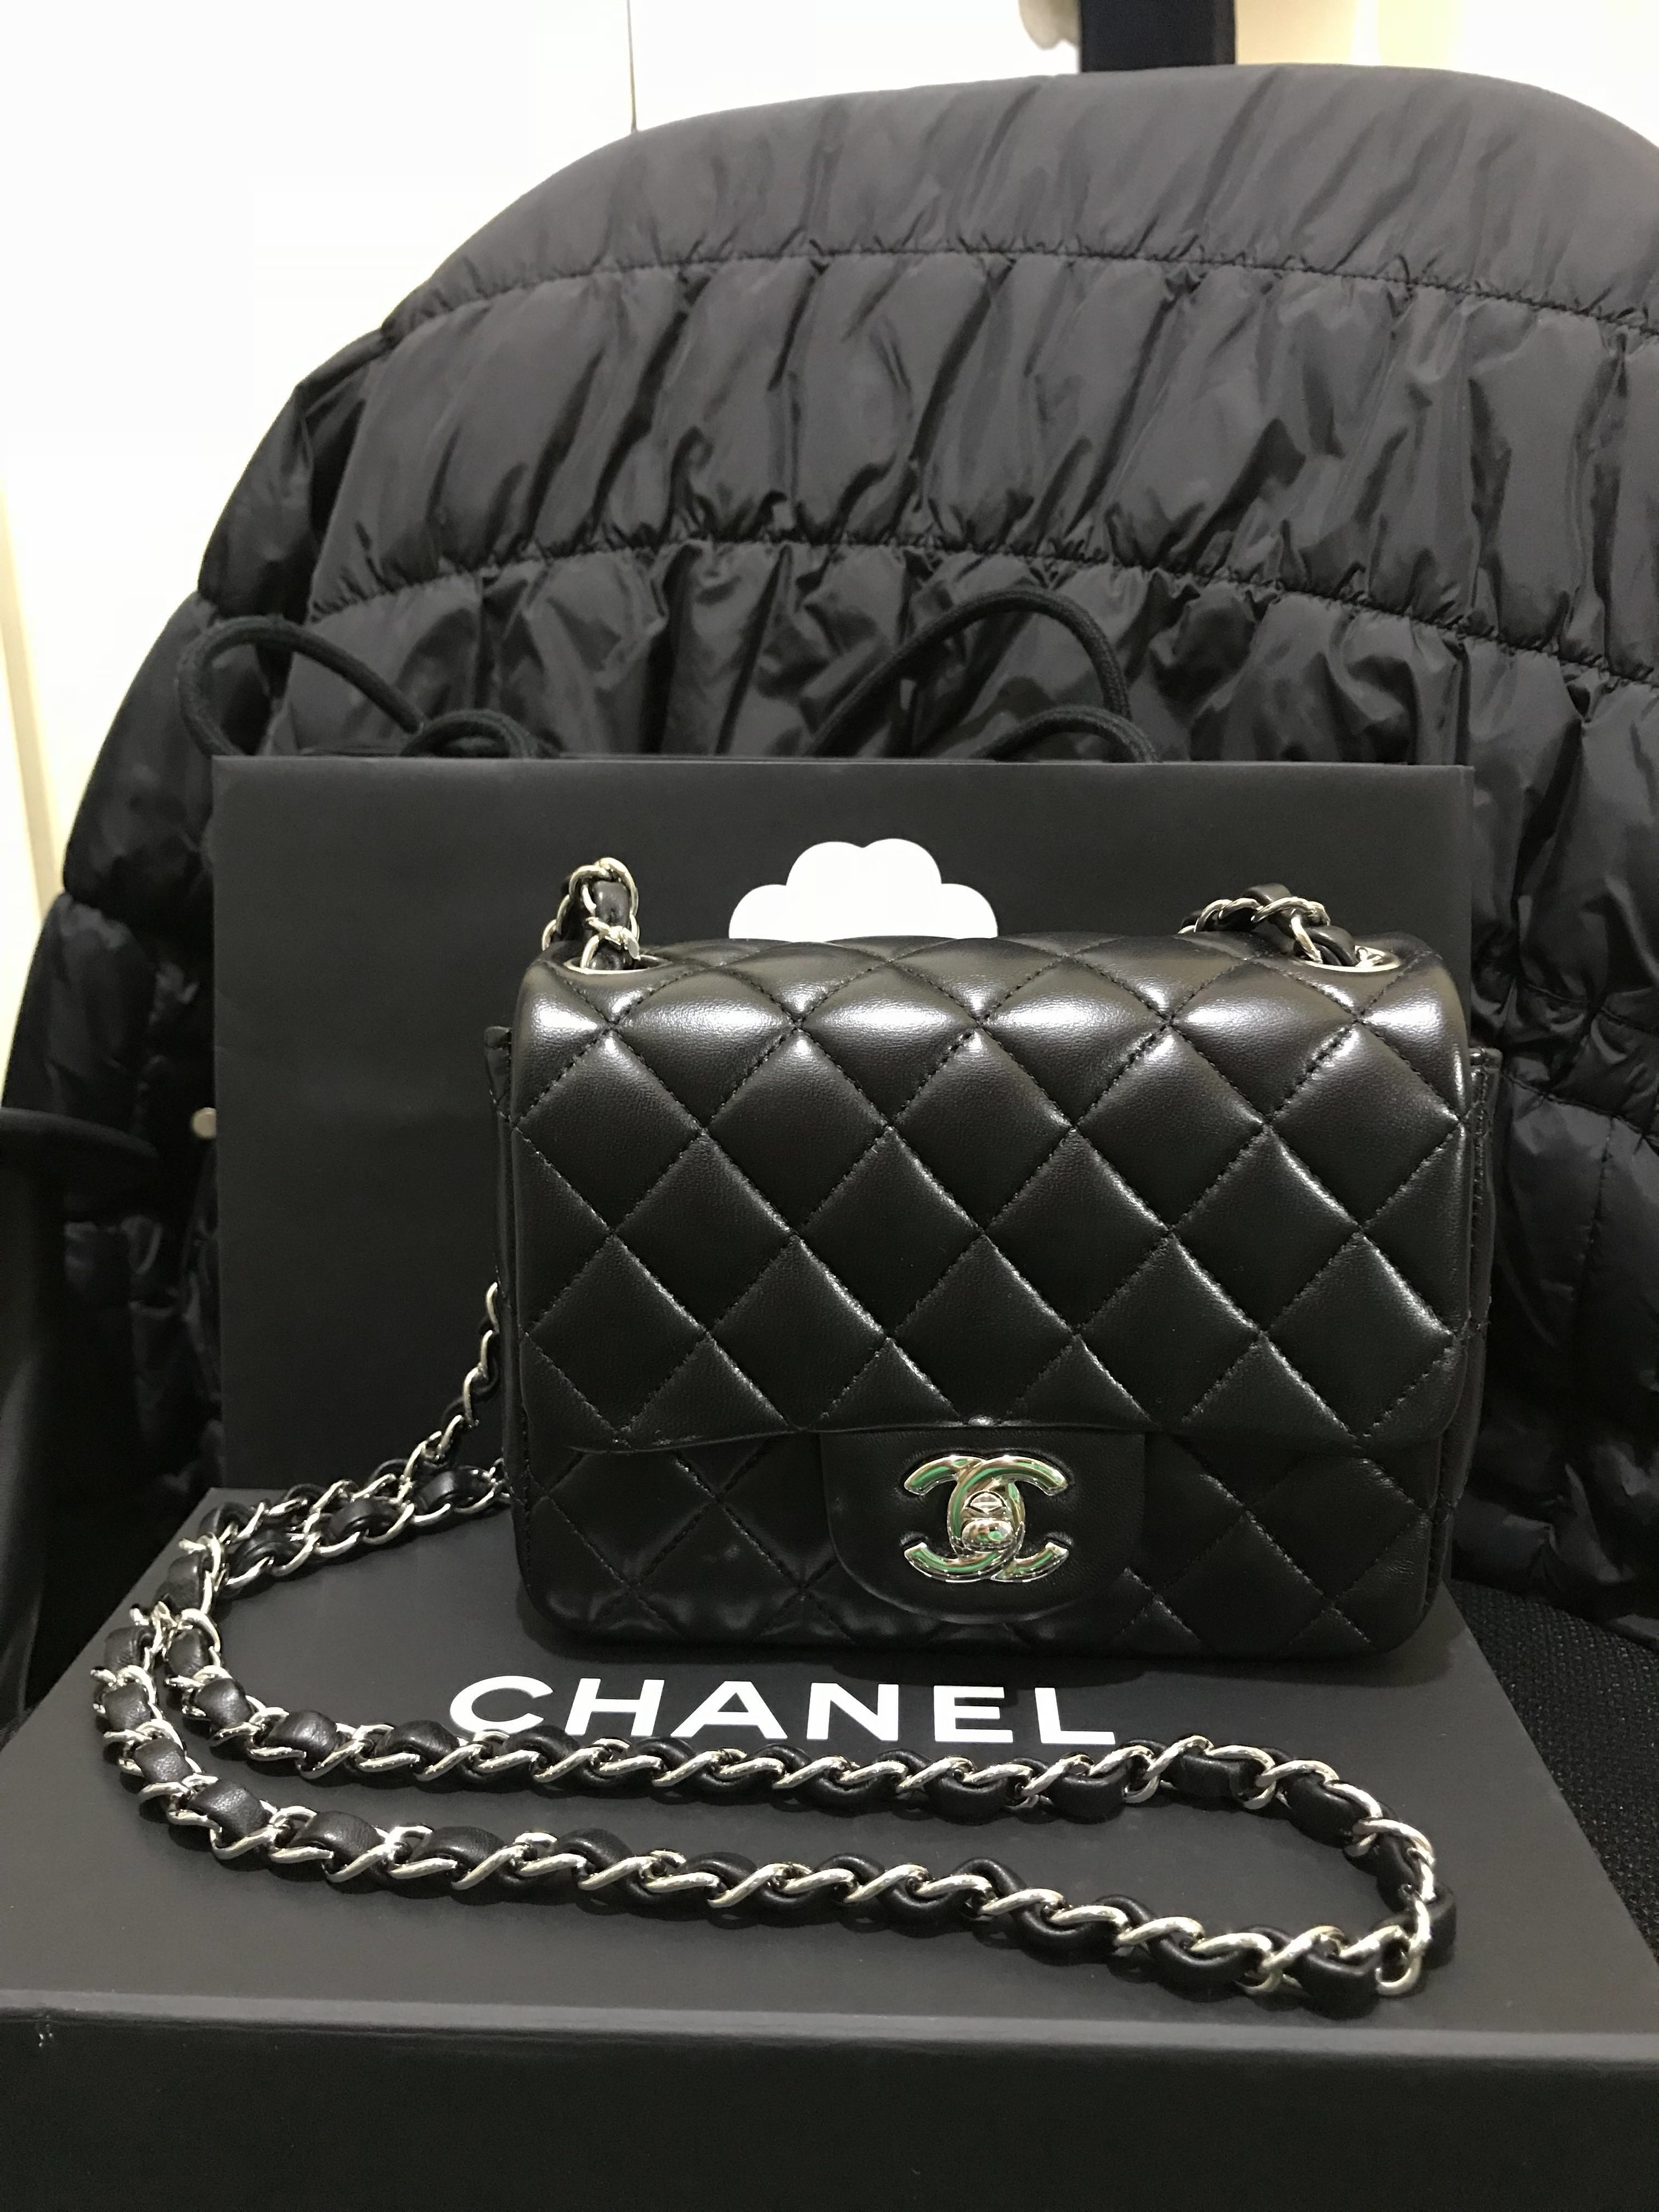 3ebbb1ccc2c4b6 Chanel mini square black lambskin 17cm, Women's Fashion, Women's Bags &  Wallets on Carousell